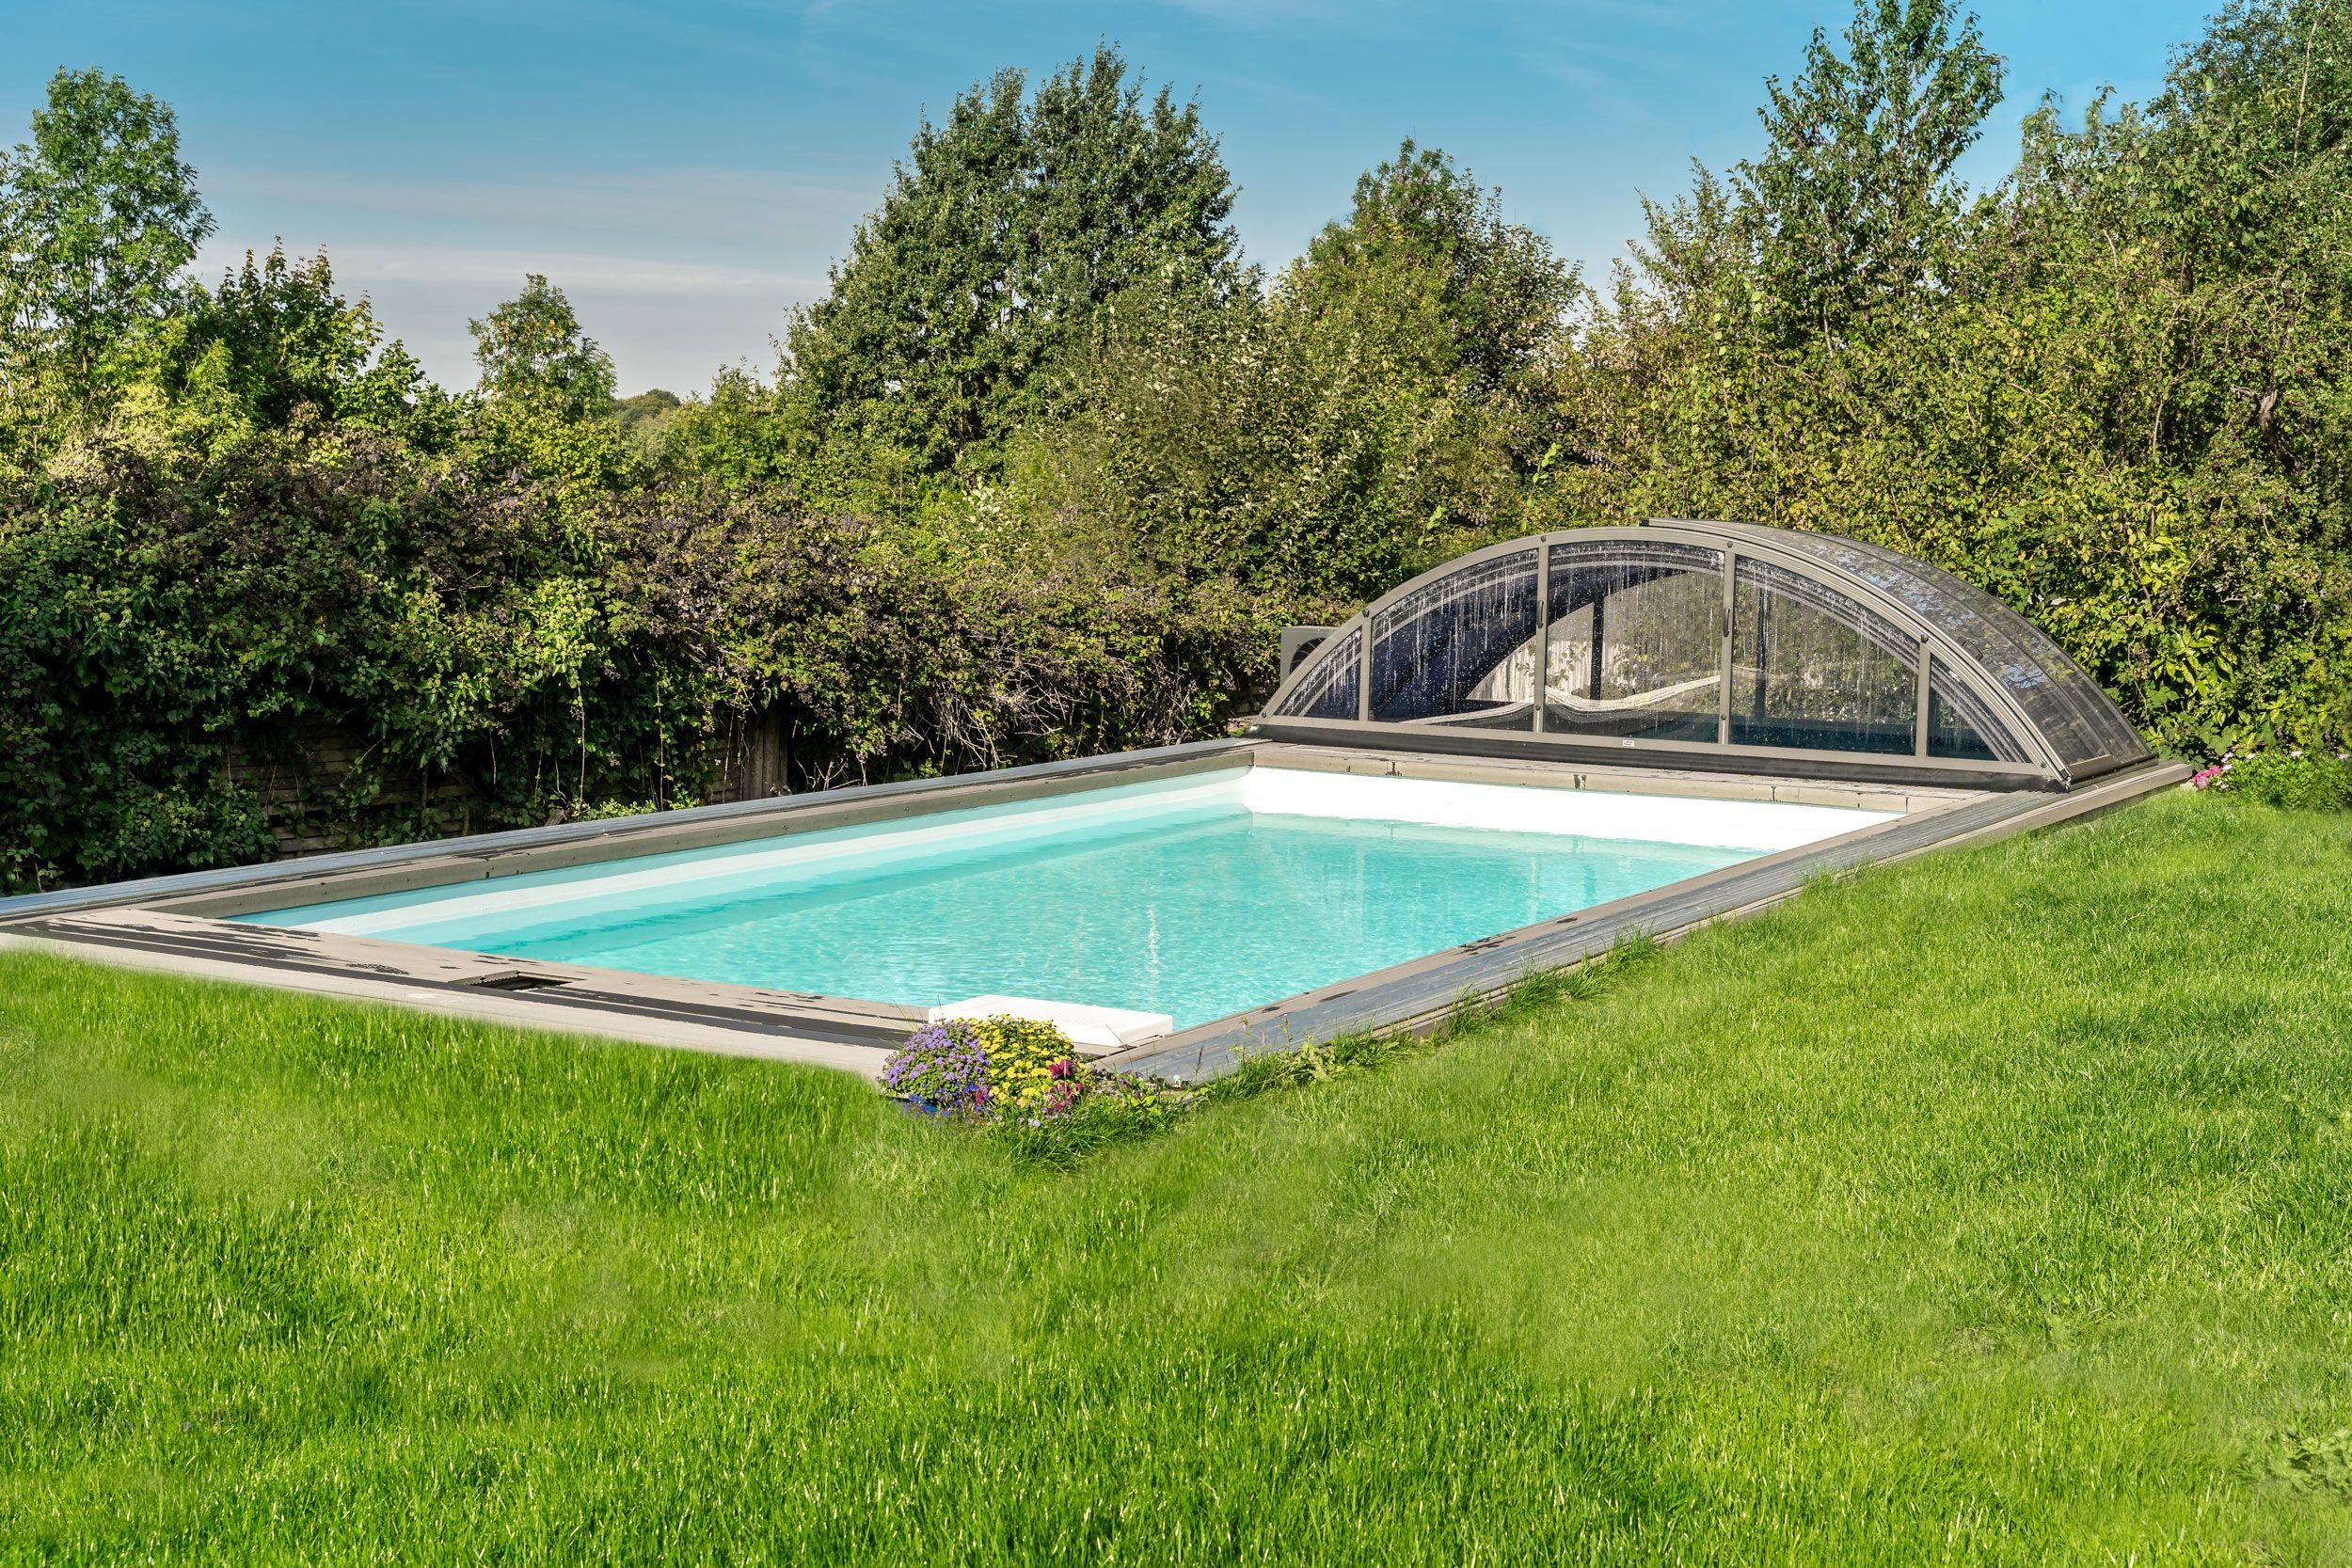 Isotherm Pool Pool Einbauen Pool Poolfolie